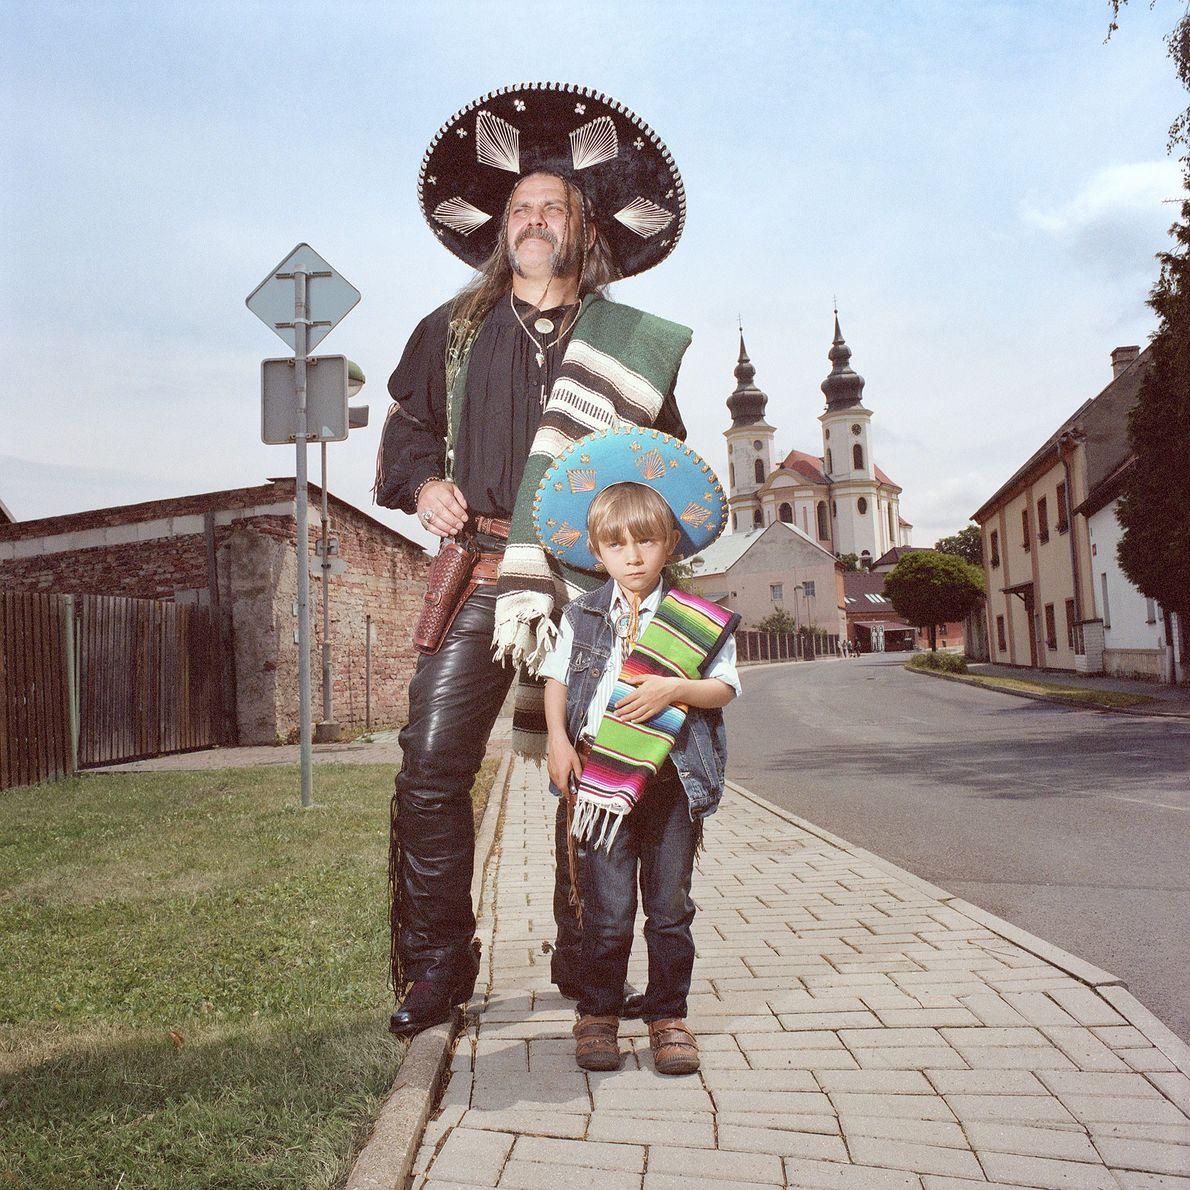 Vater und Sohn mit Sombrero